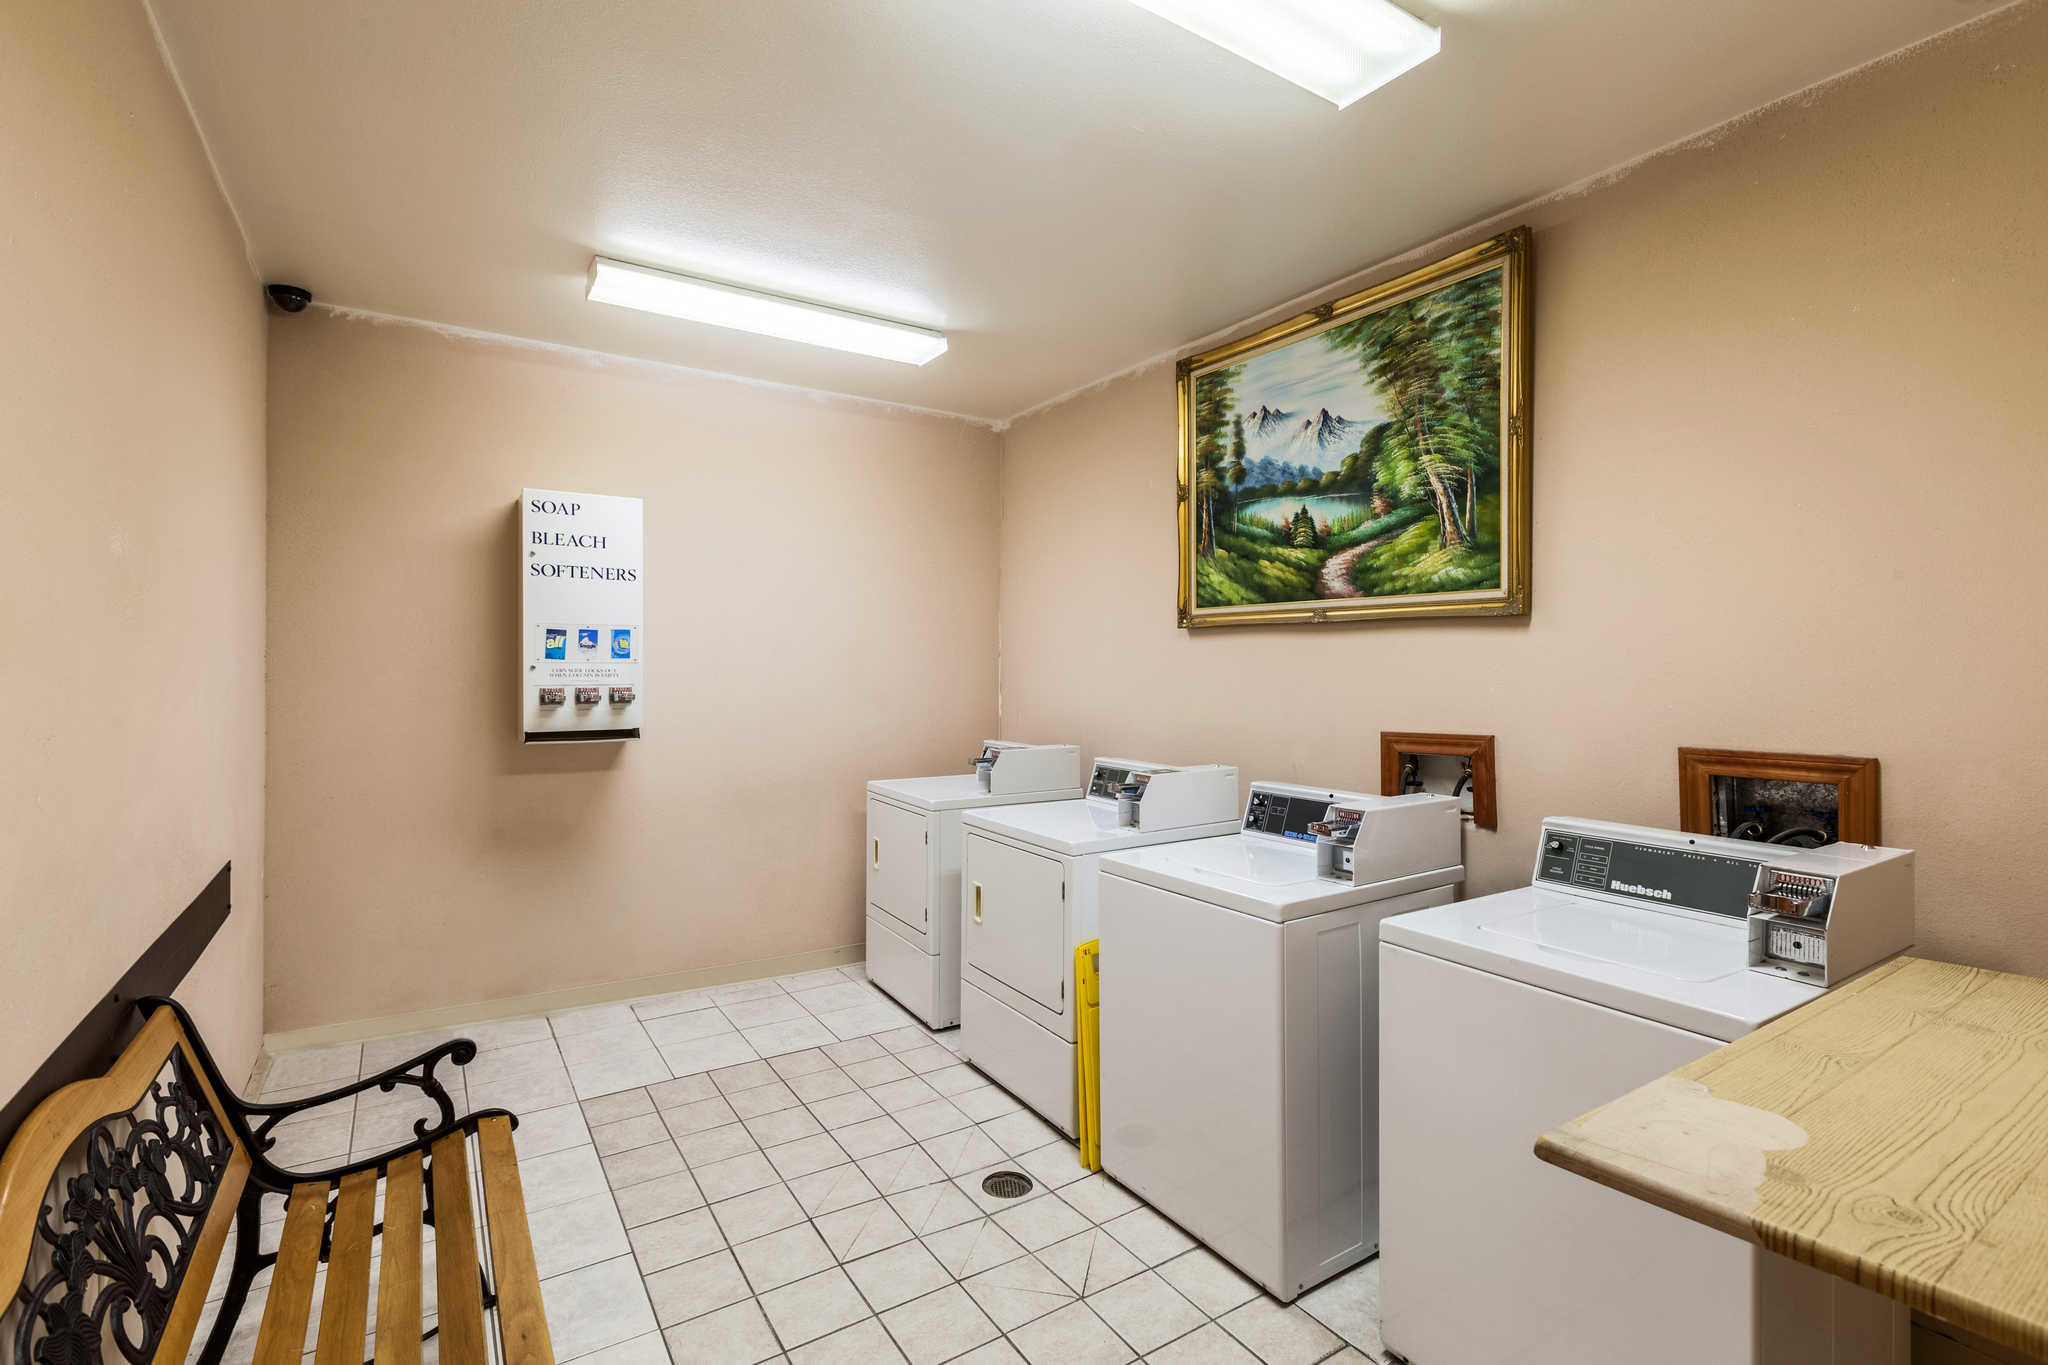 Craigslist Winchester Va Rooms For Rent